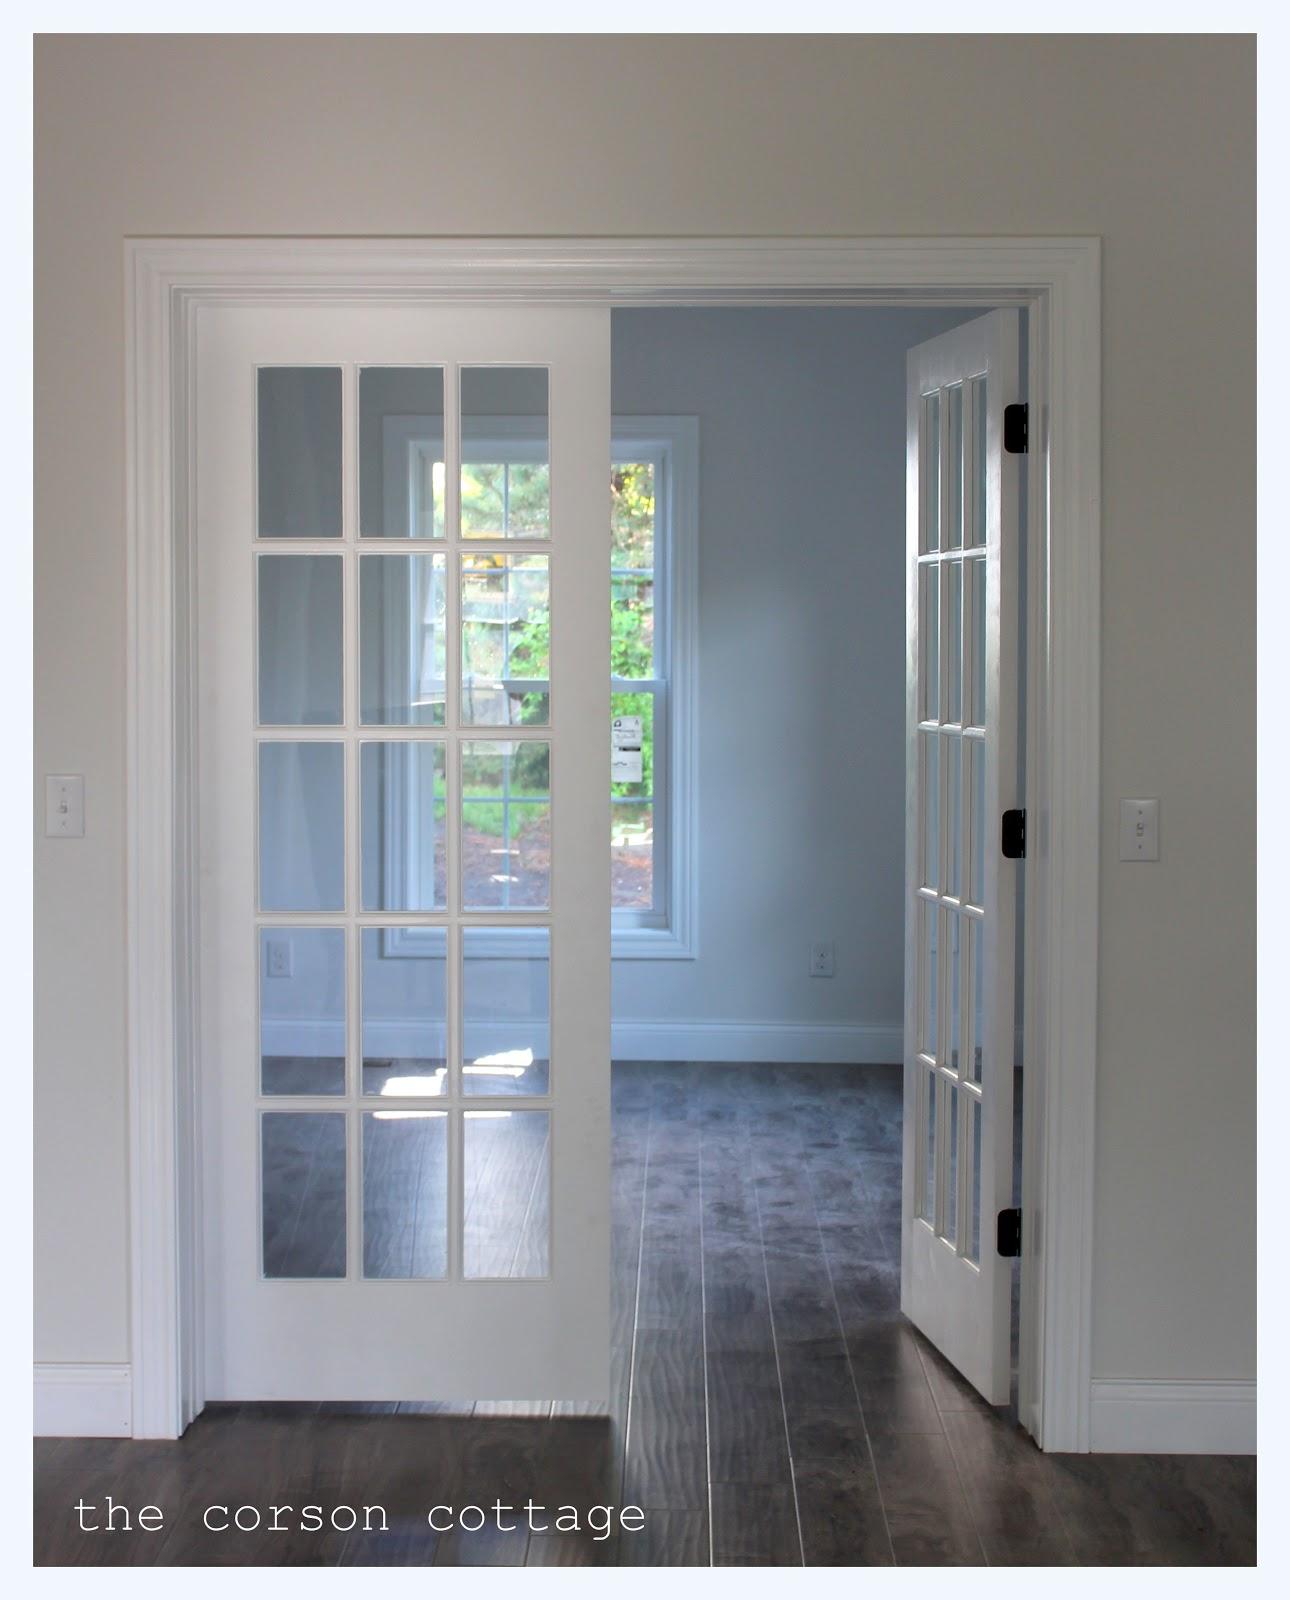 Nas buduci domcek :) - takymito dverami by som chcela uzavriet nocnu cast .